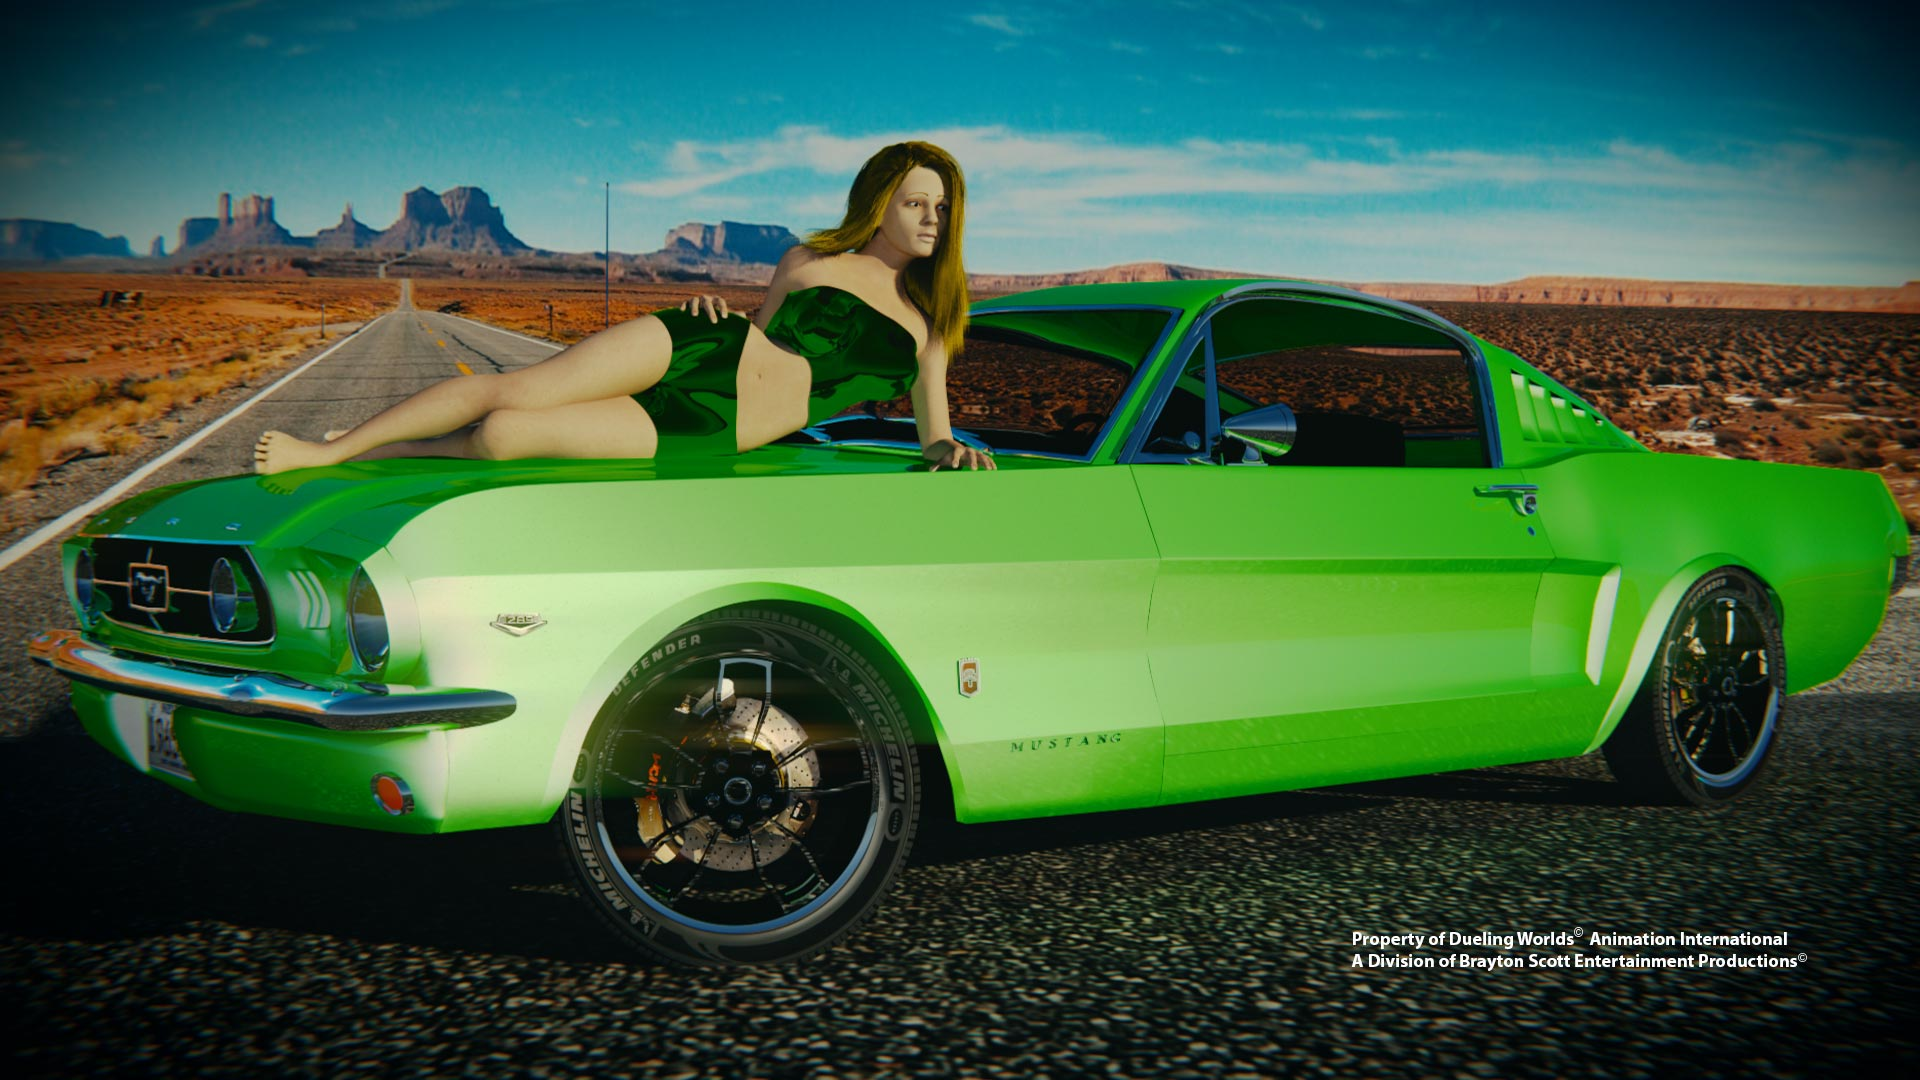 Image of Dueling Worlds© Render Cloud- Dueling Worlds© International Mustang Sally on Hood Green 1965 Mustang GT Fastback